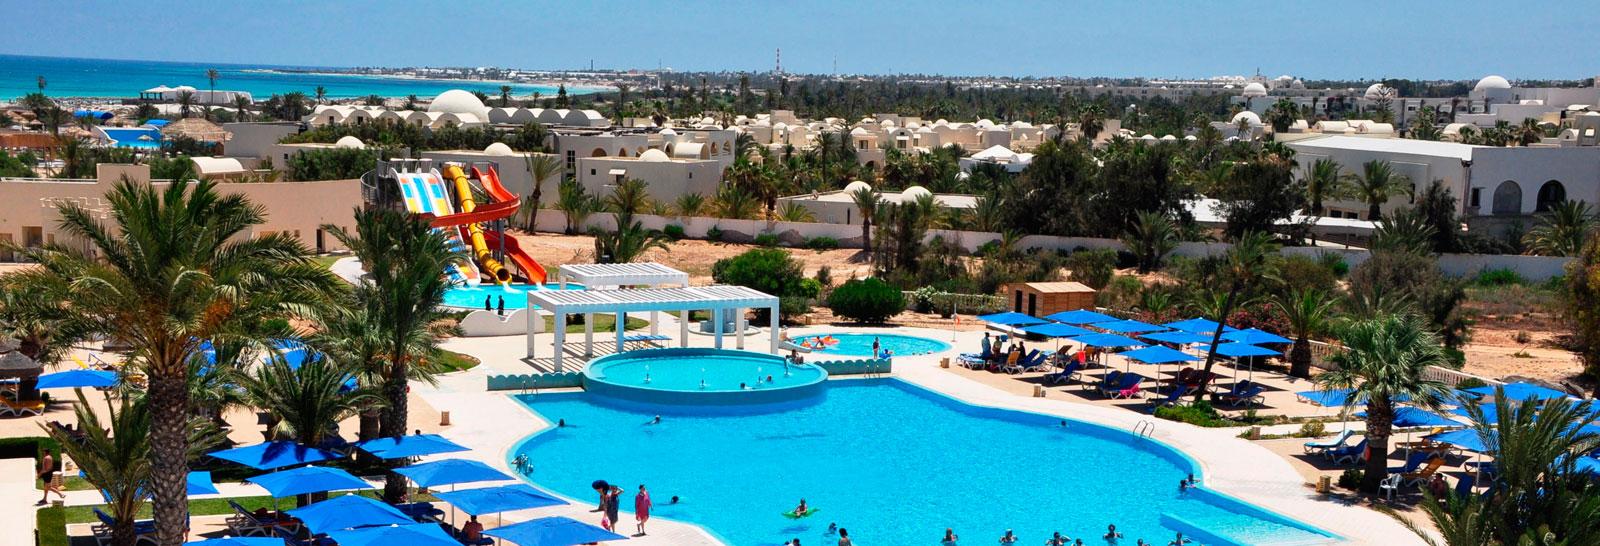 Hotel Checkin Bakour Splash | by Checkin | Web Oficial